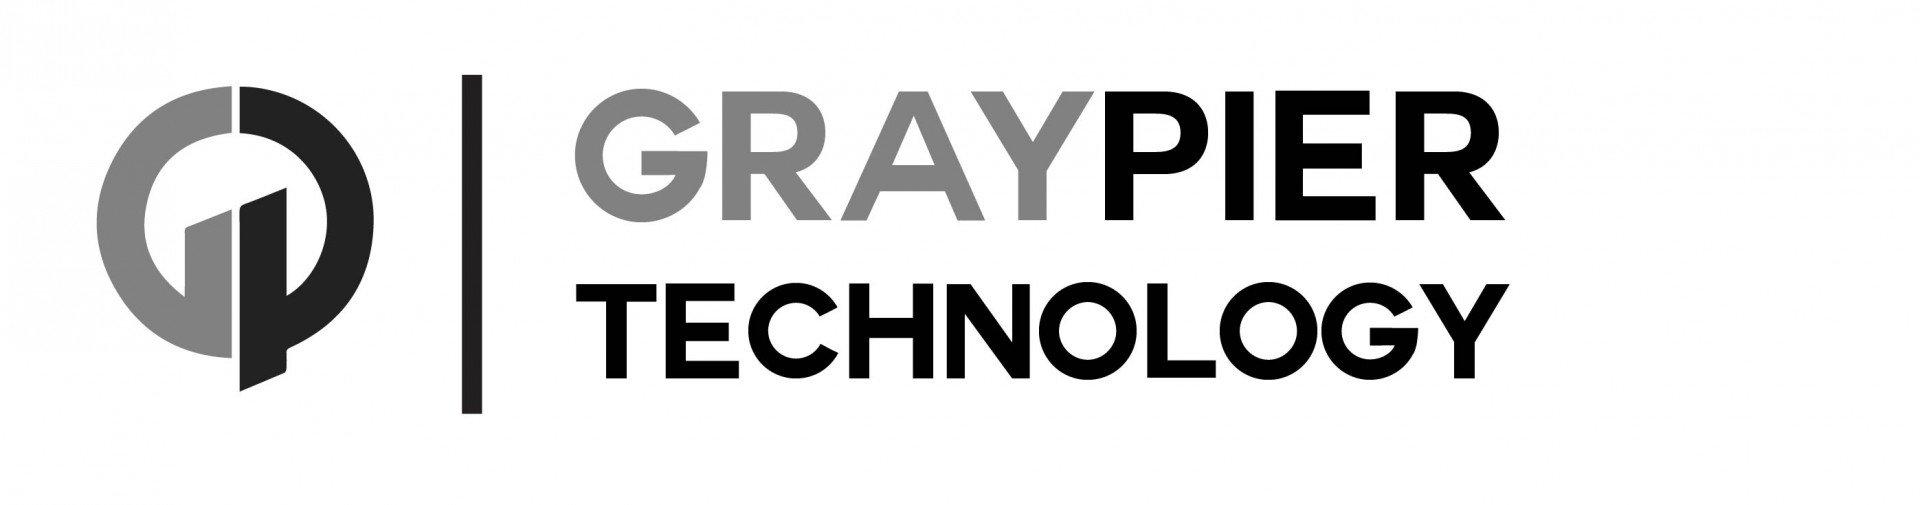 GrayPier Technology